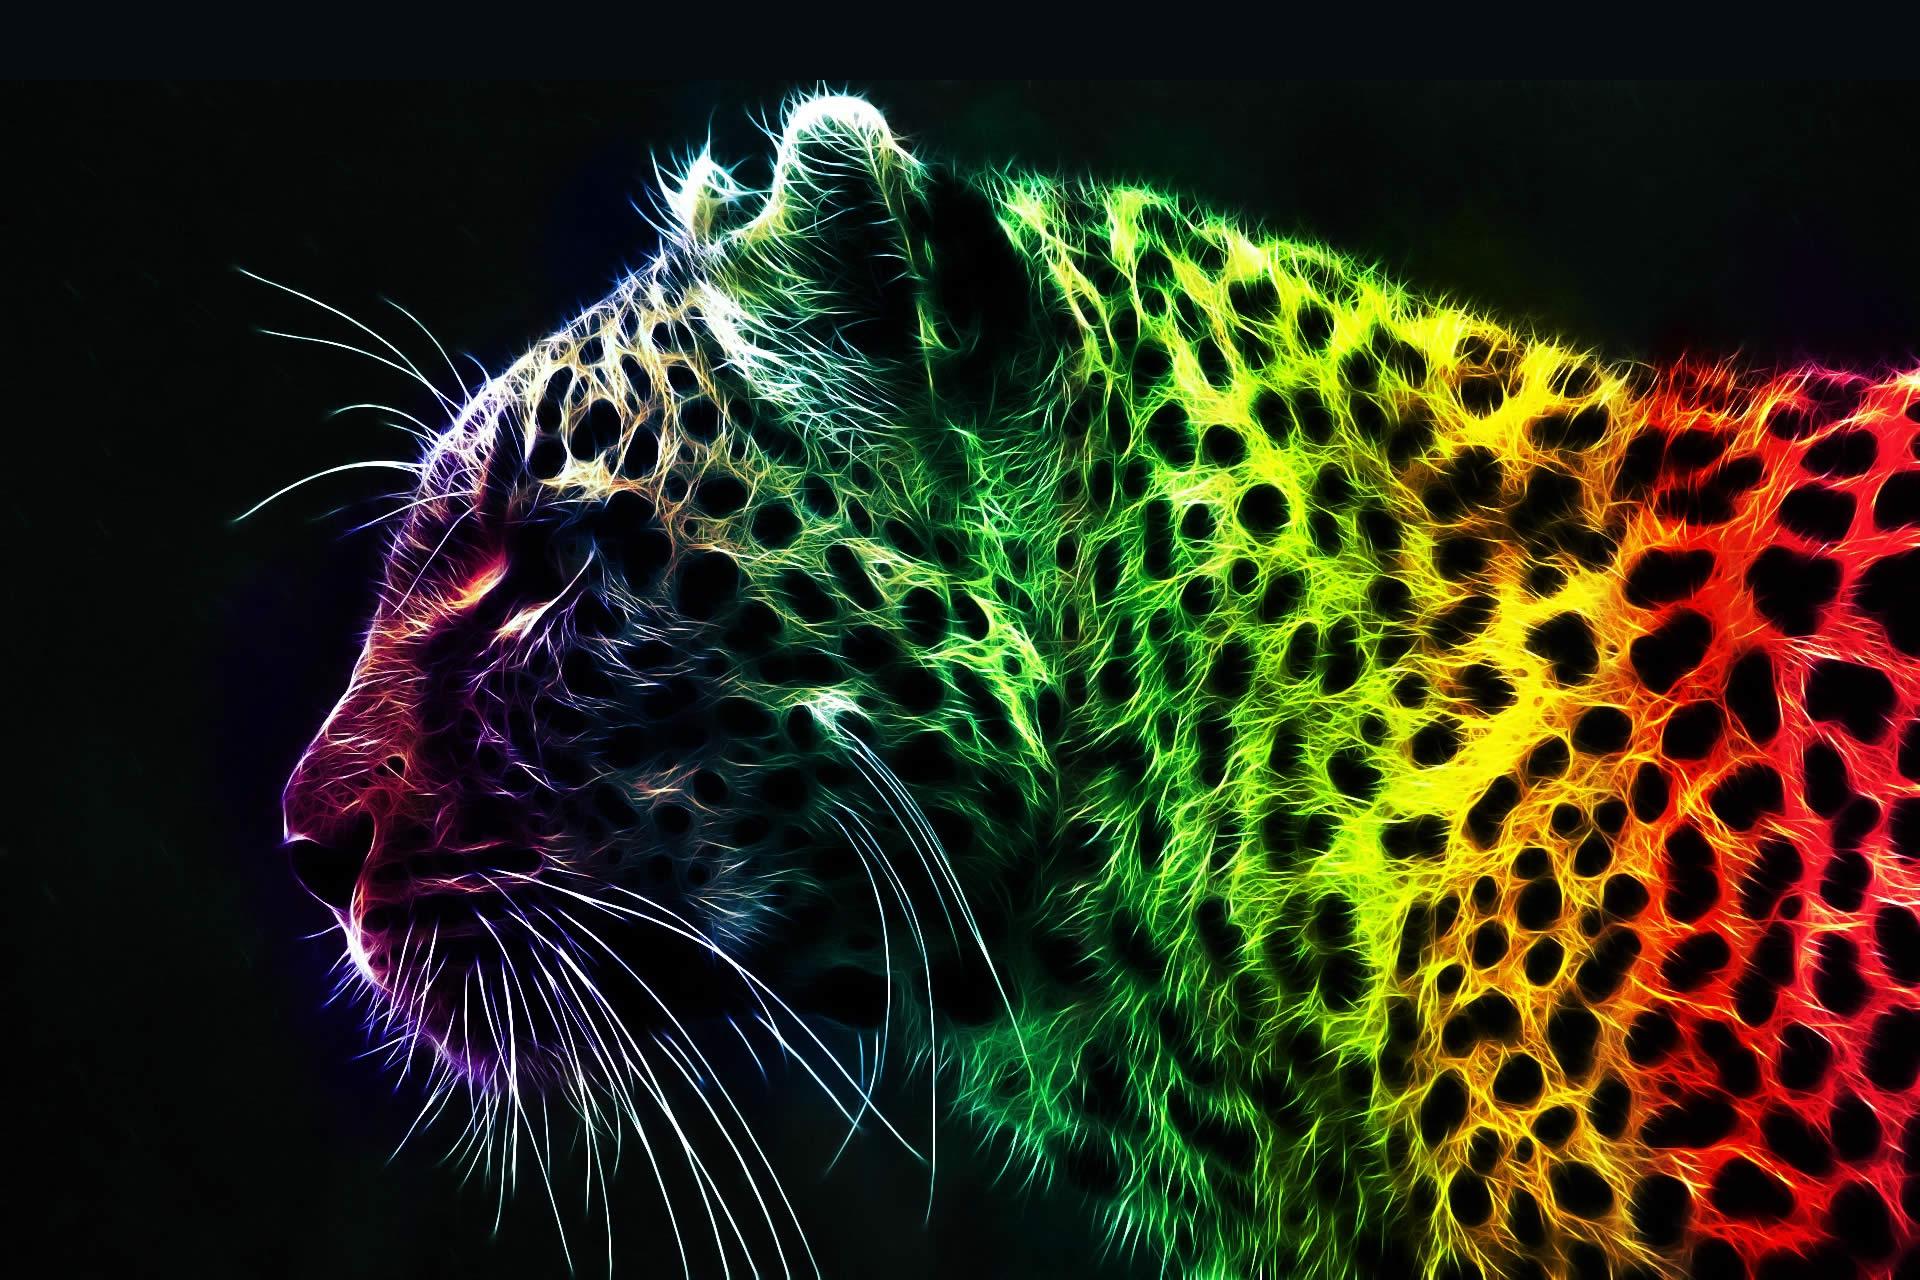 colorful-ISNET-5